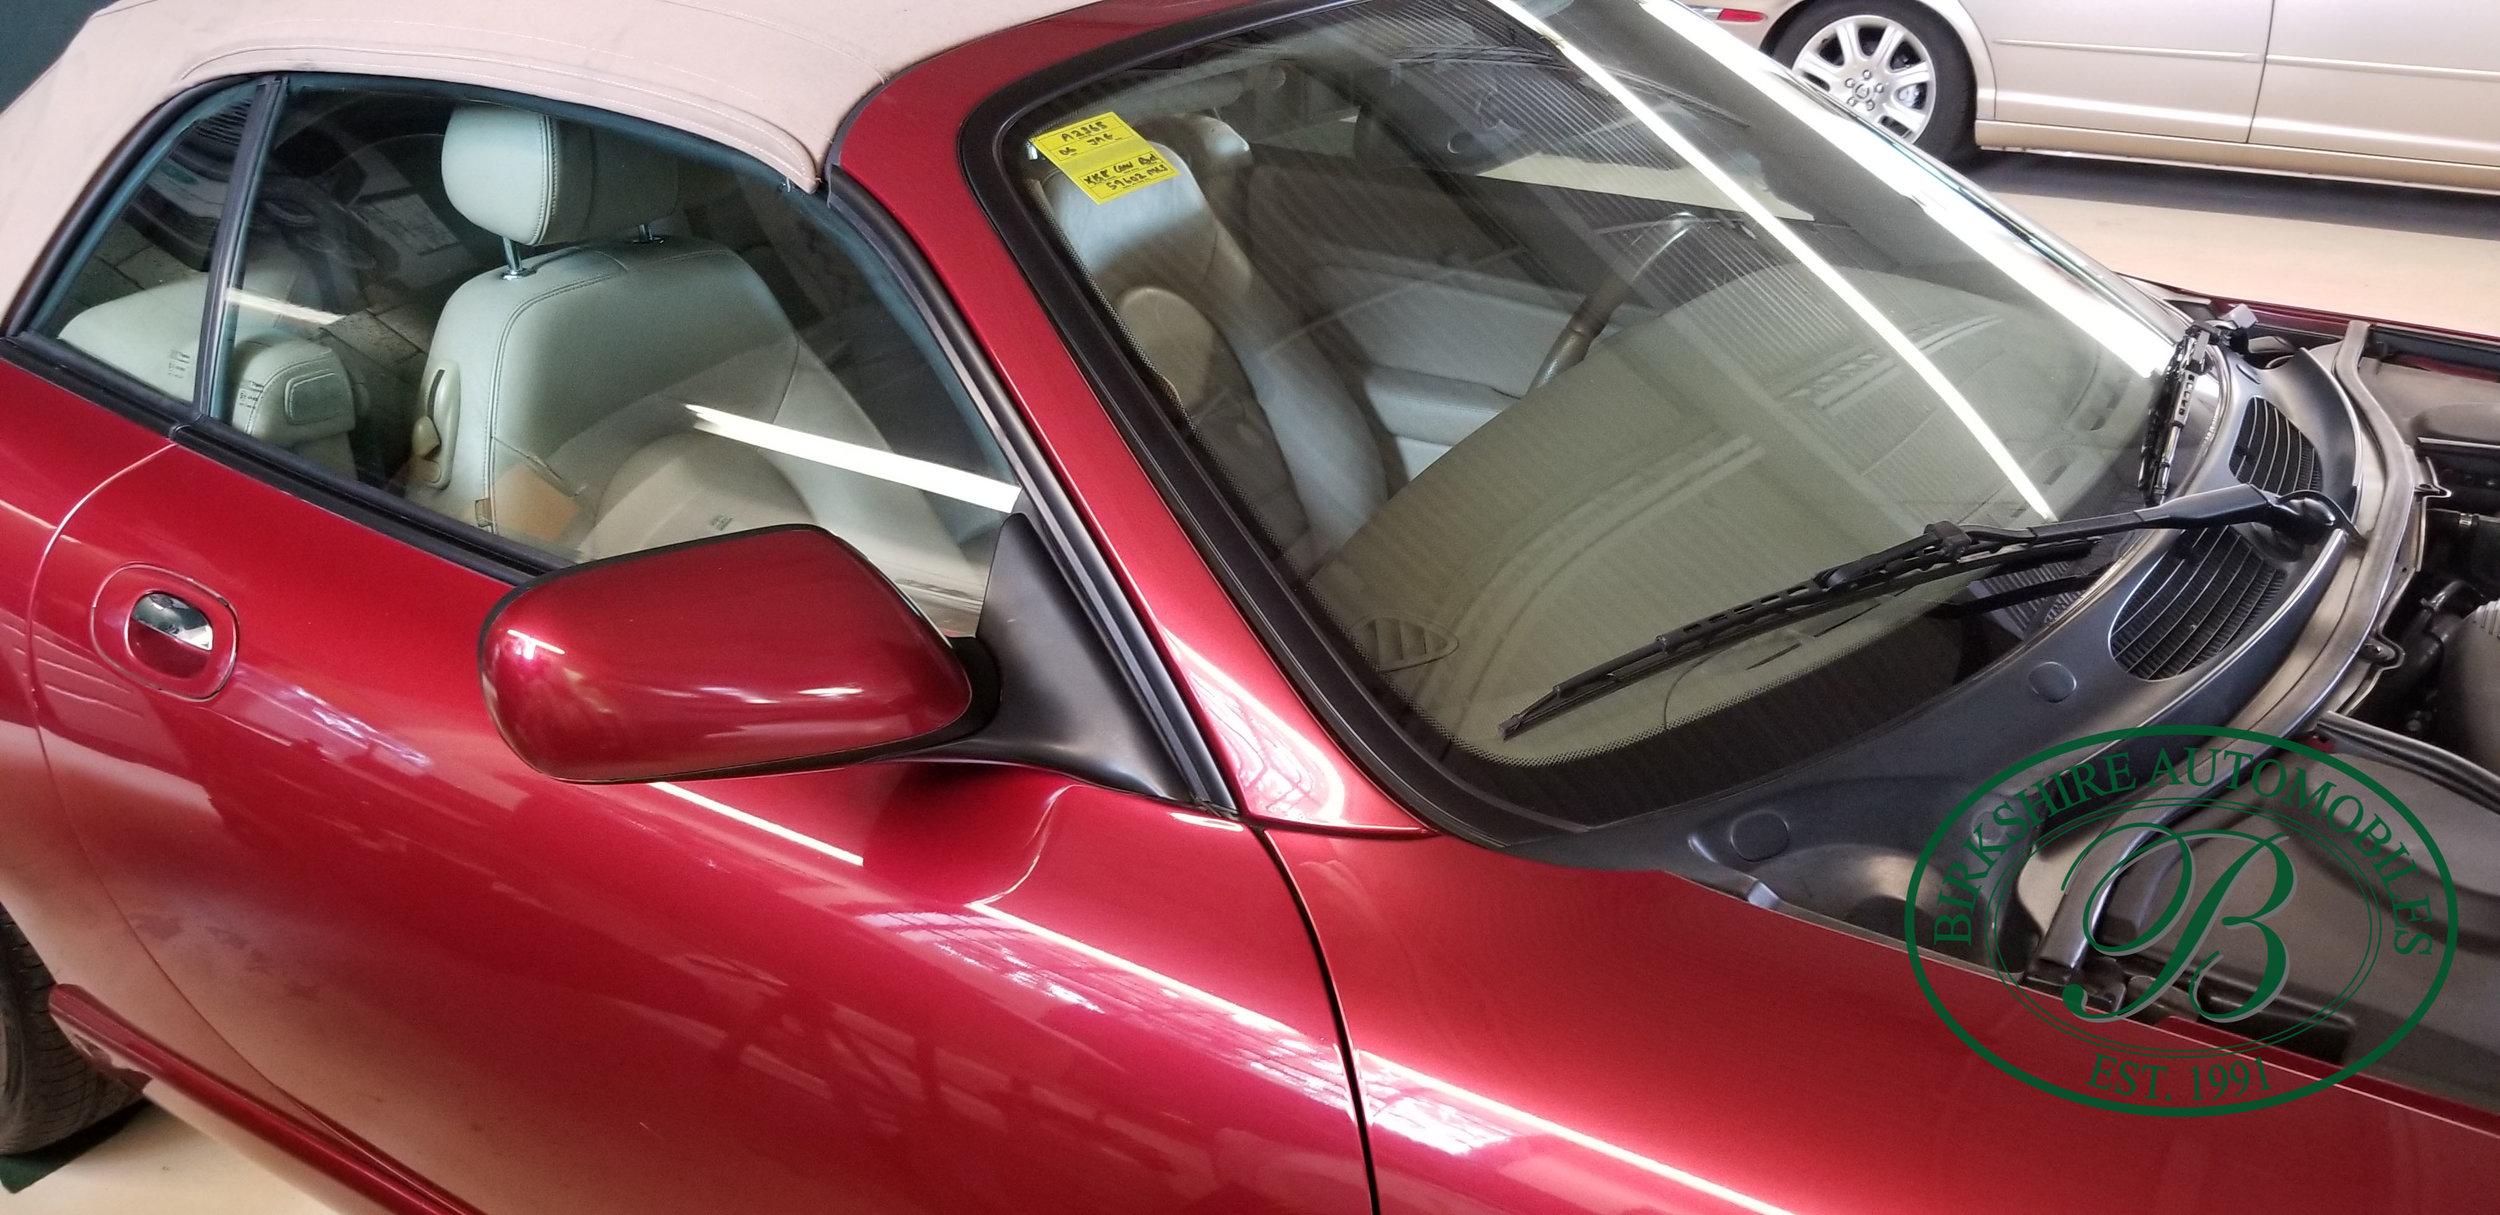 2006 Jaguar XK8 Convertible - Birkshire Automobiles Thornhill (20).jpg